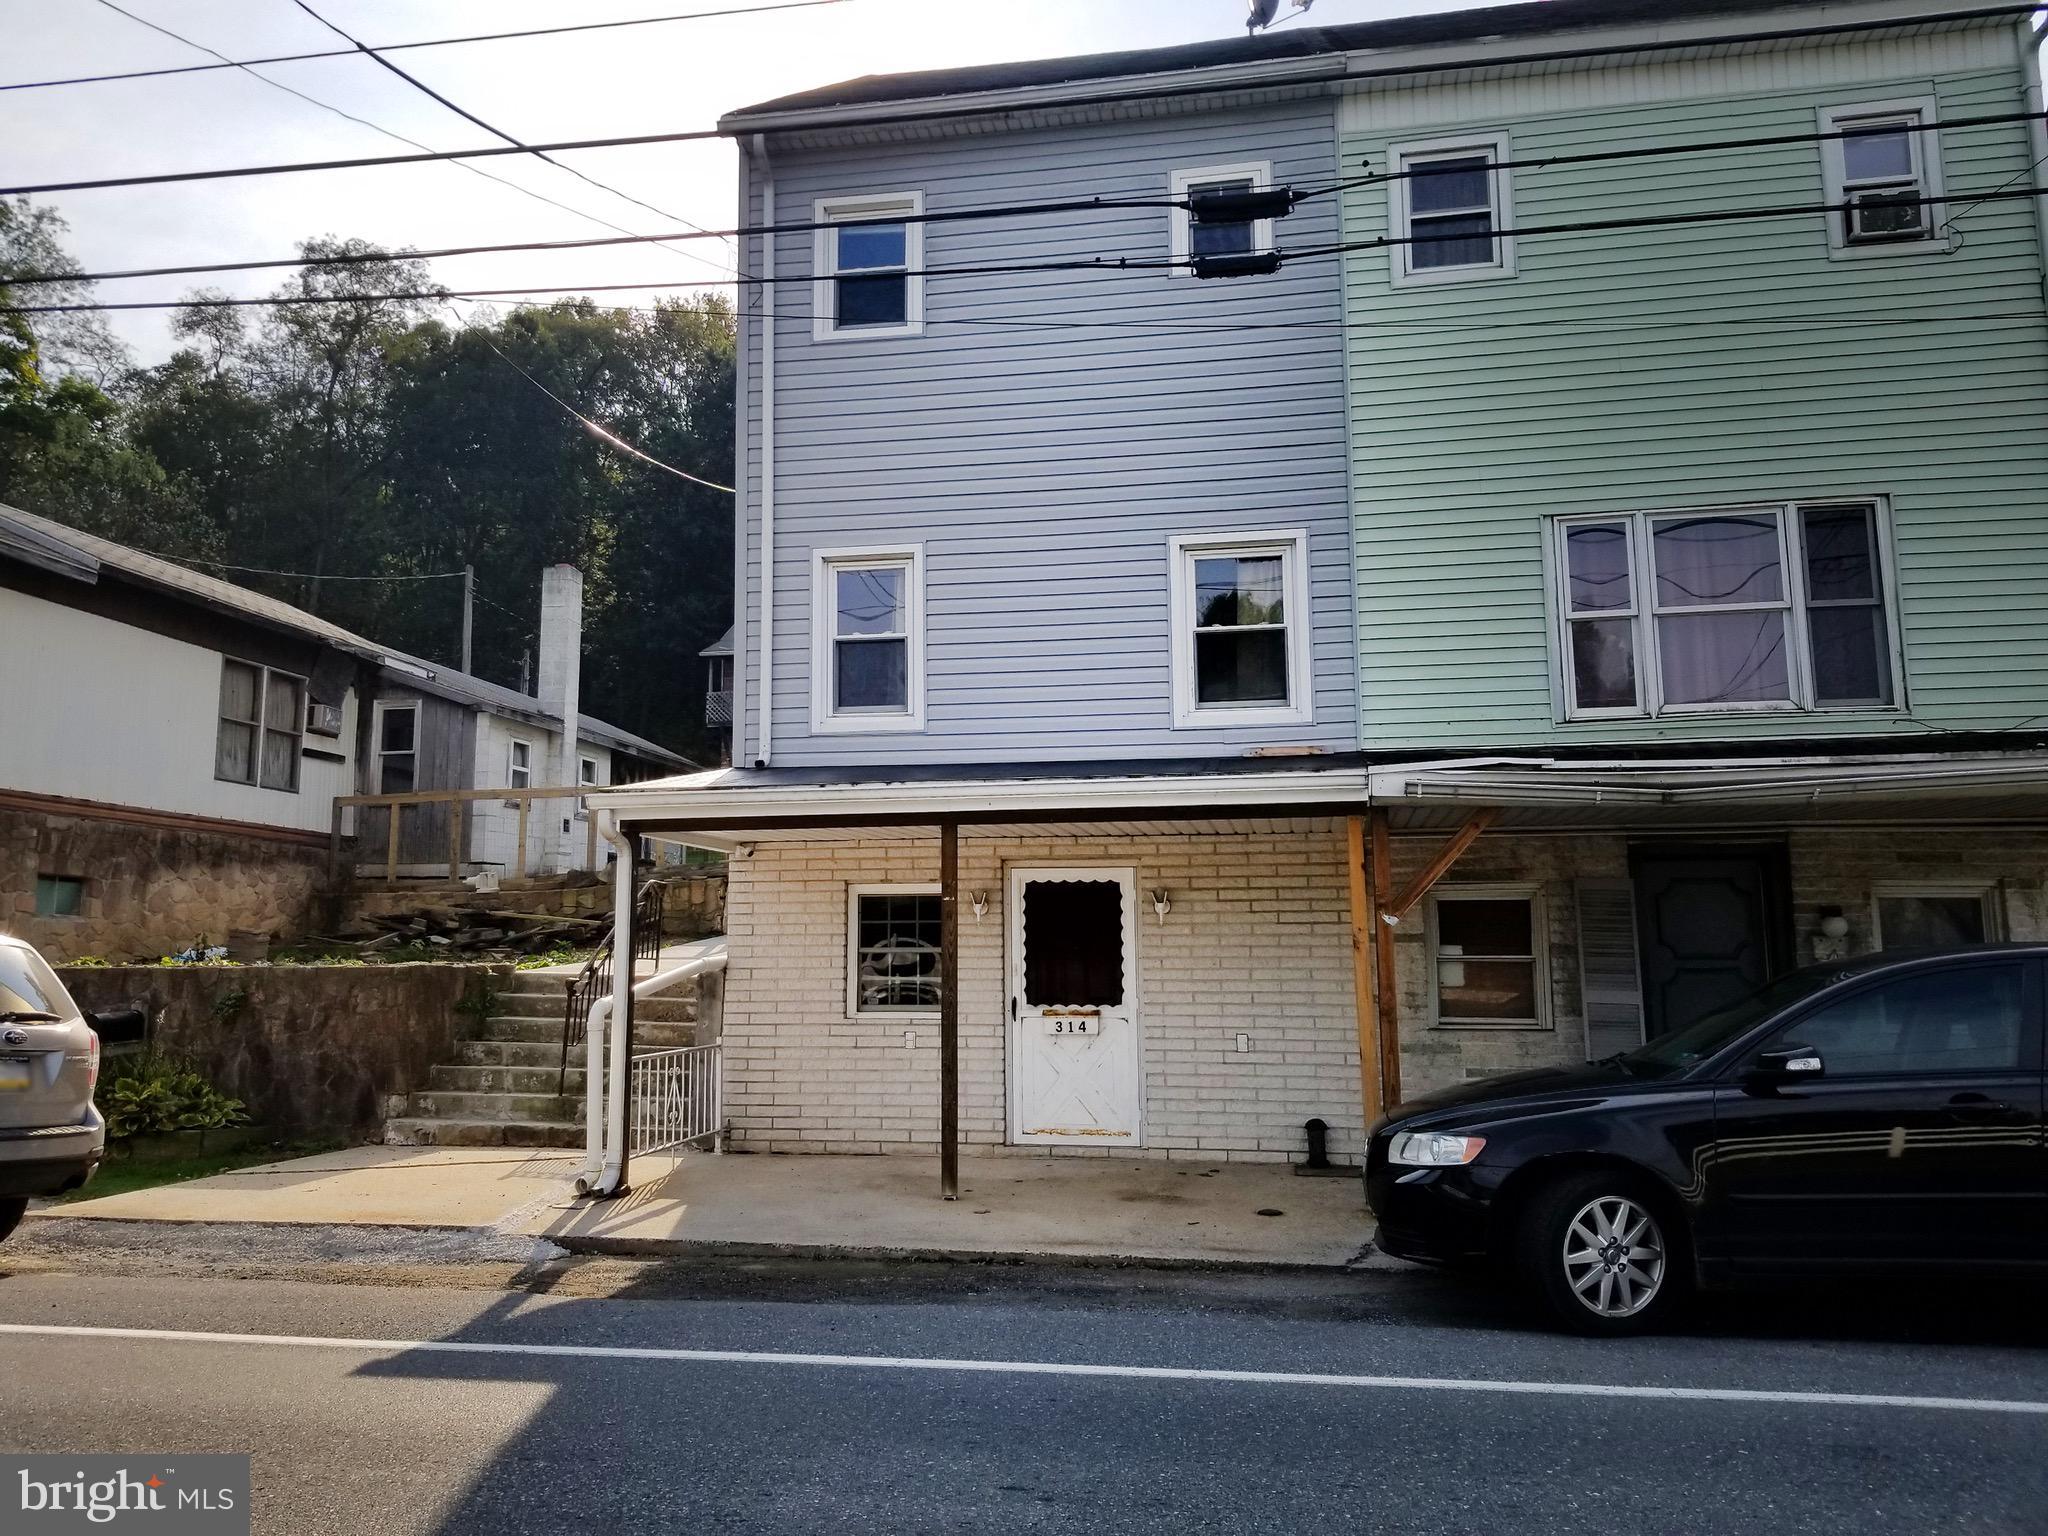 314 E MAIN STREET, TREMONT, PA 17981